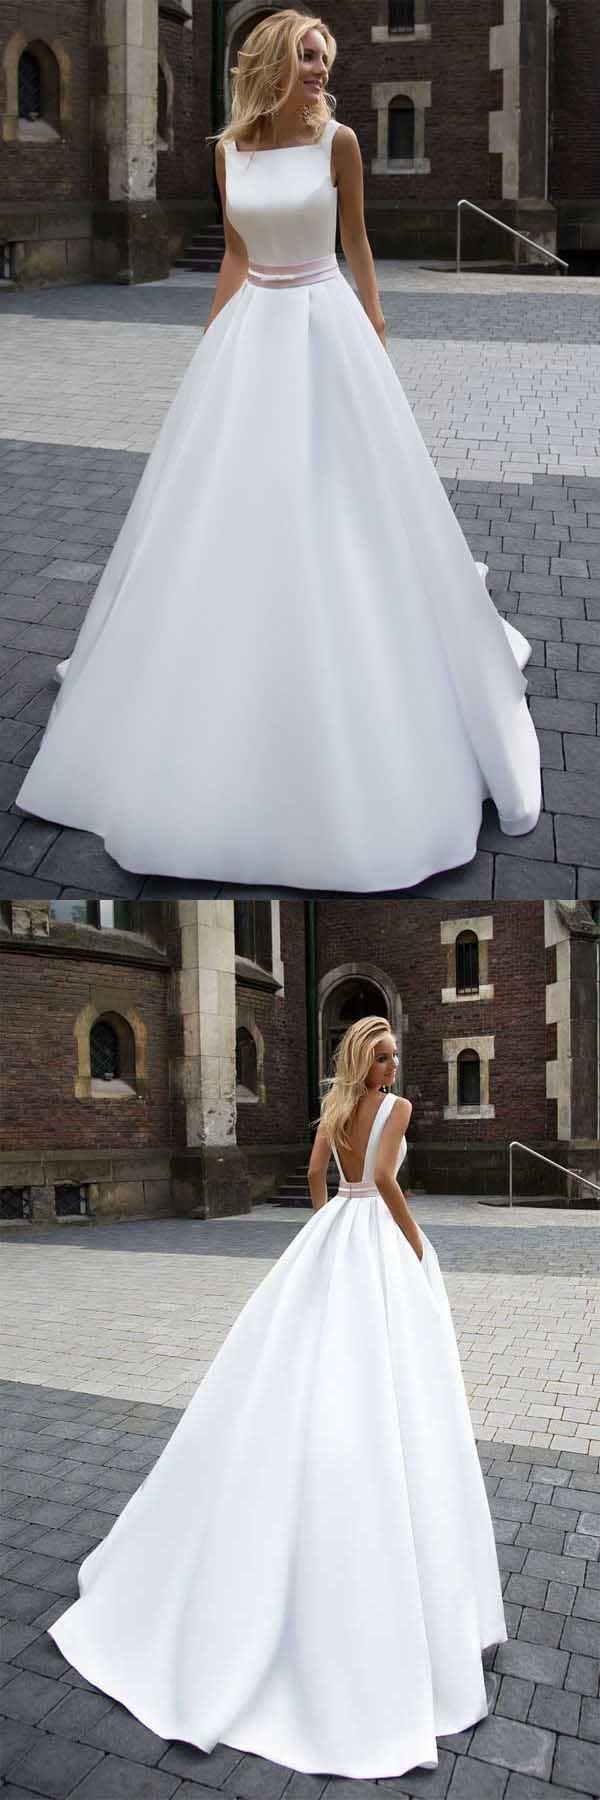 On Sale Princess Simple A-line Satin Ivory Wedding Dresses WD205 #wedding #dress #pgmdress